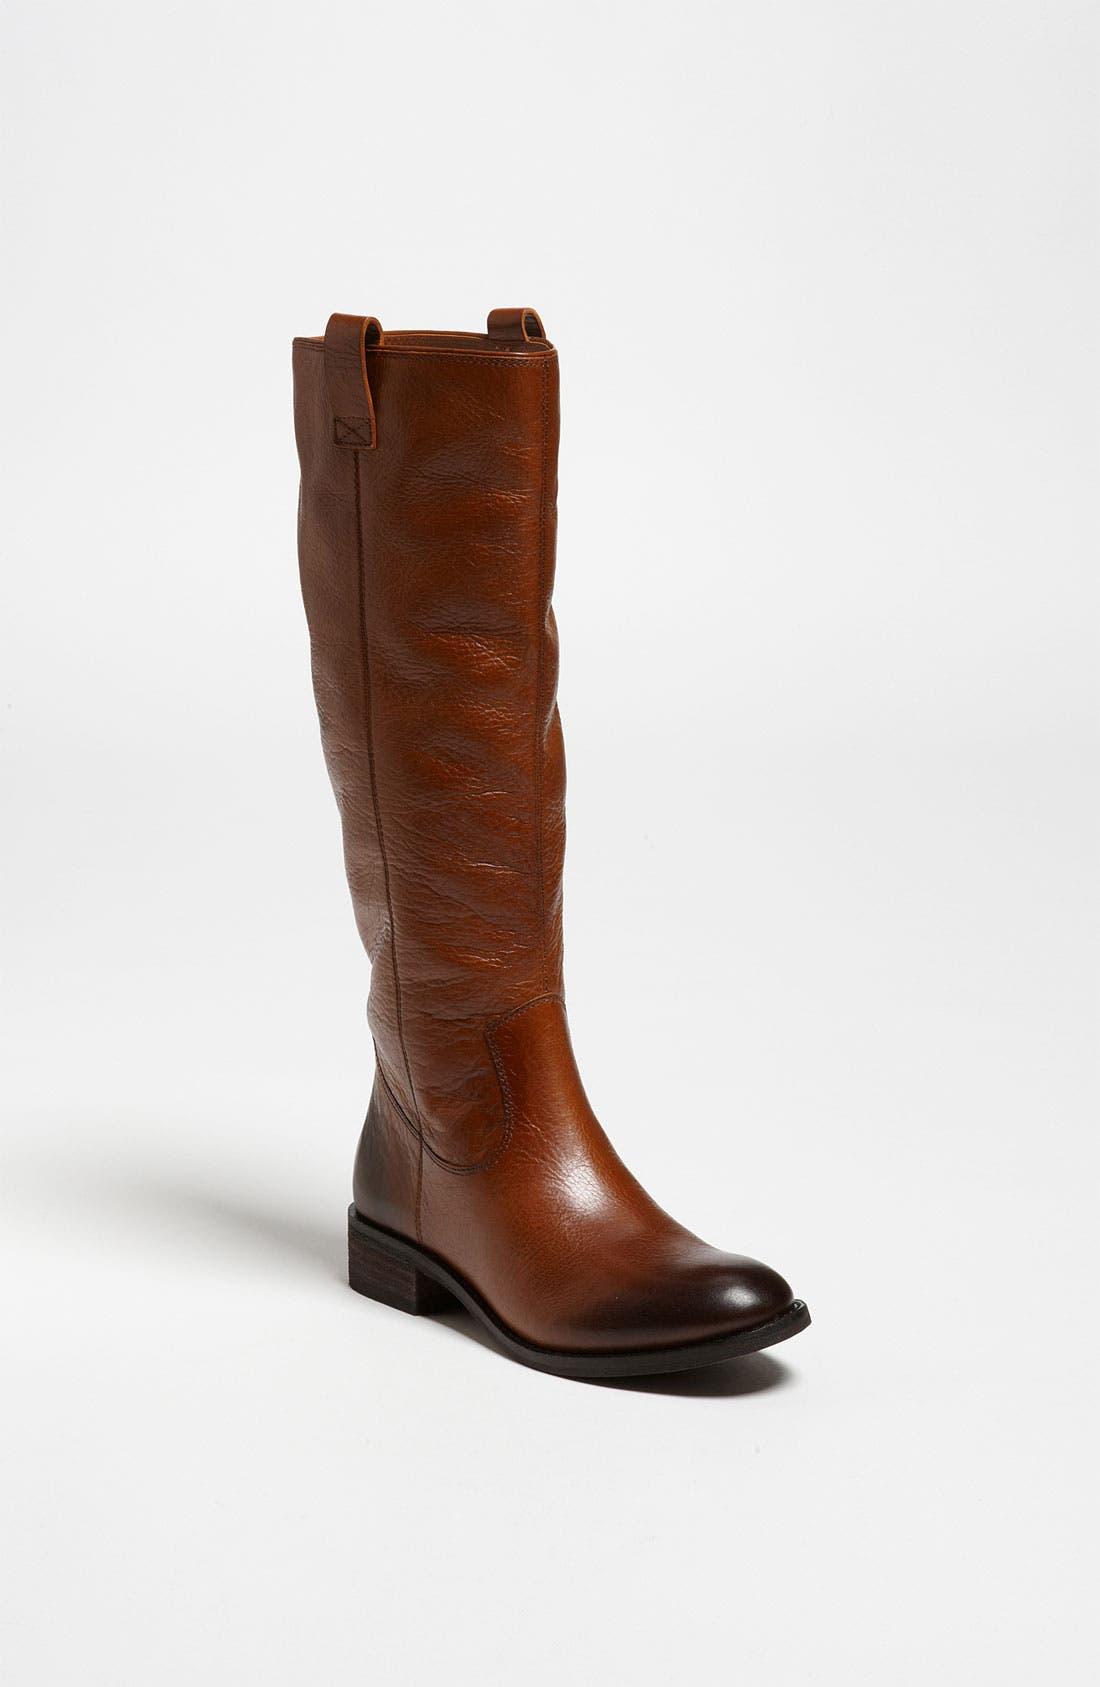 Main Image - Jessica Simpson 'Esteem' Boot (Wide Calf)